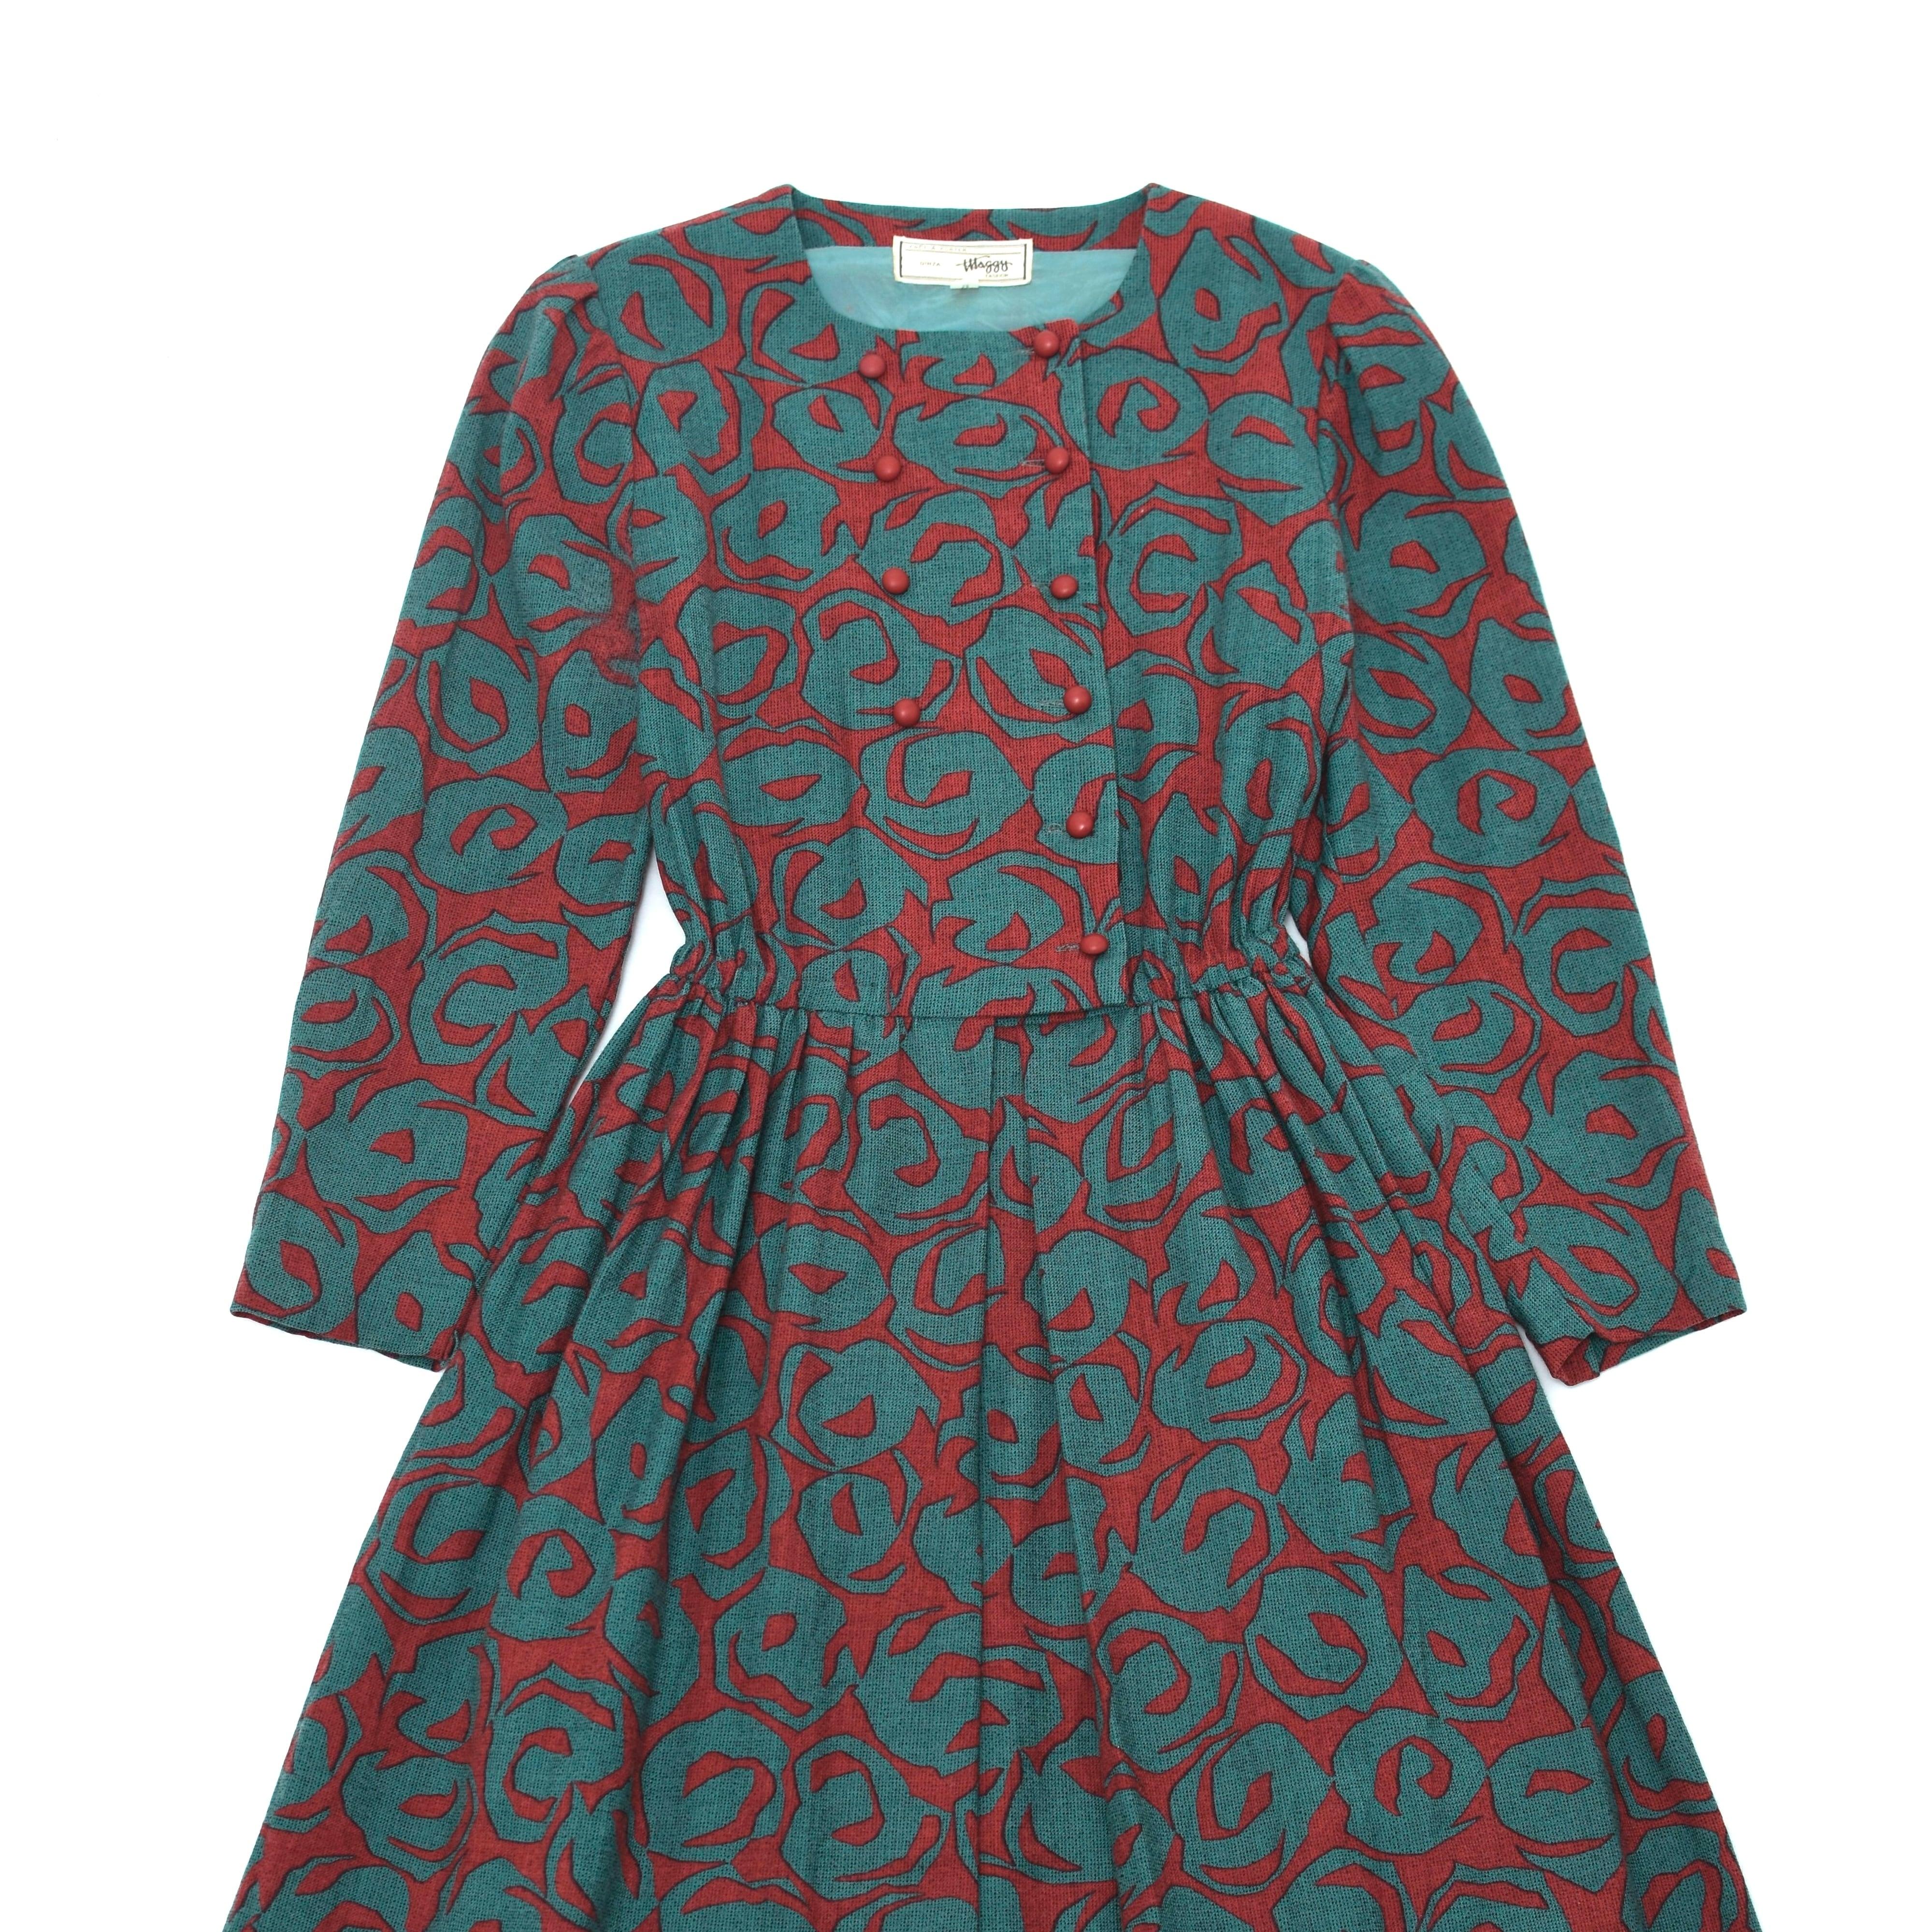 Japan vintage retro pattern one piece